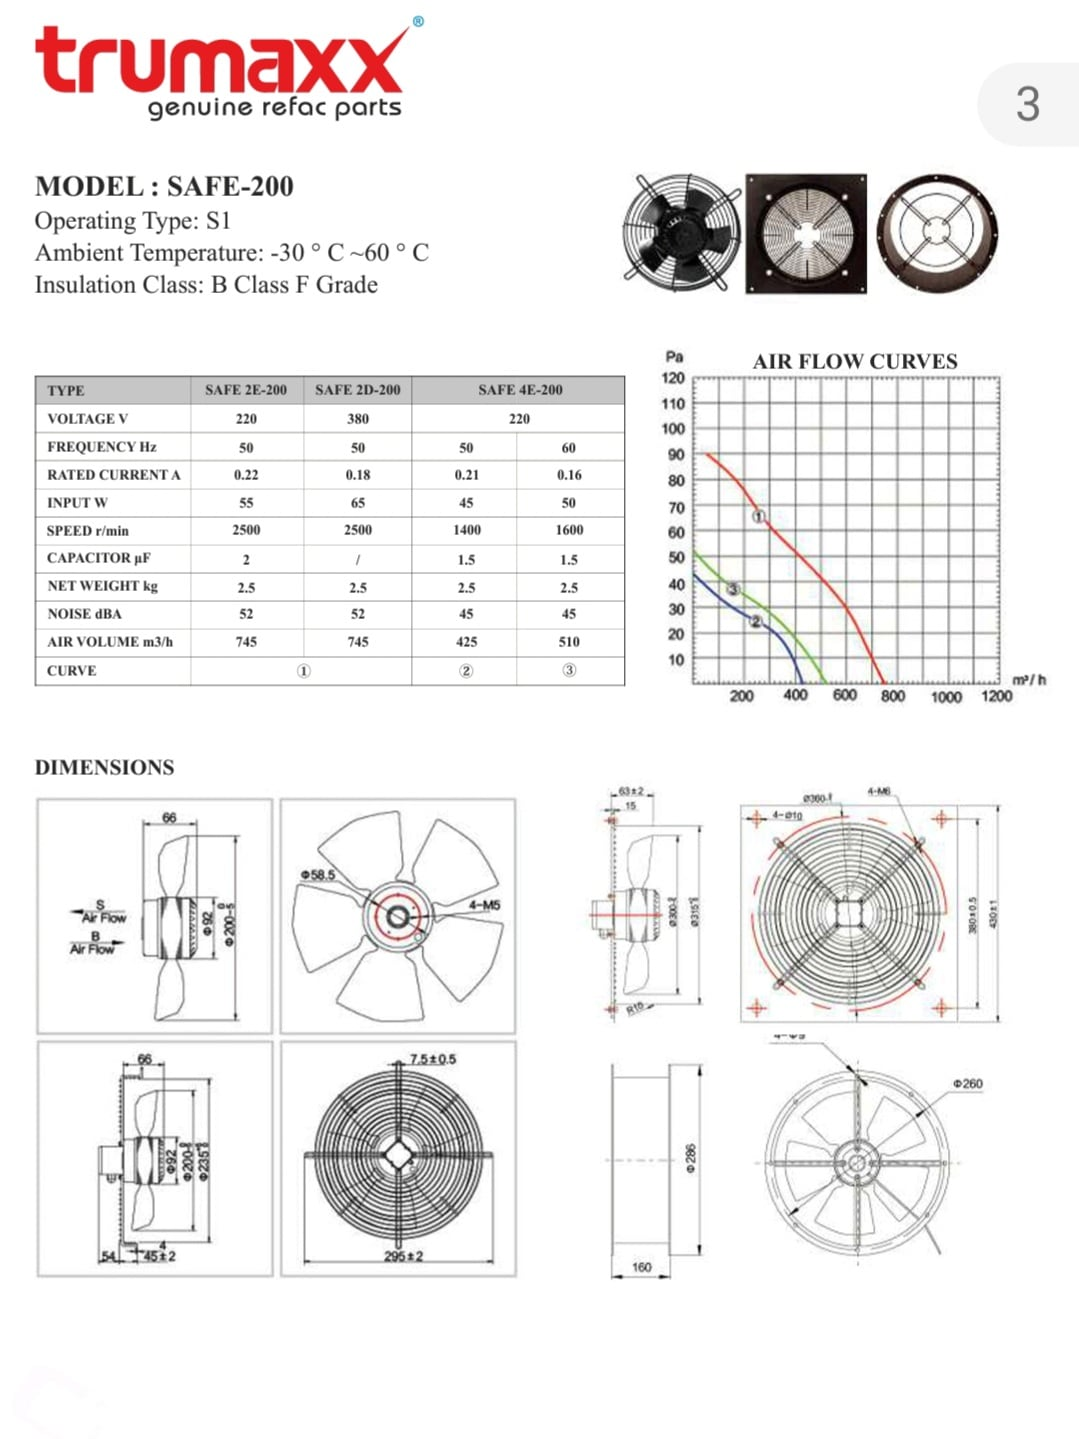 TRUMAXX AXIAL FAN (4E 200 B) (8')